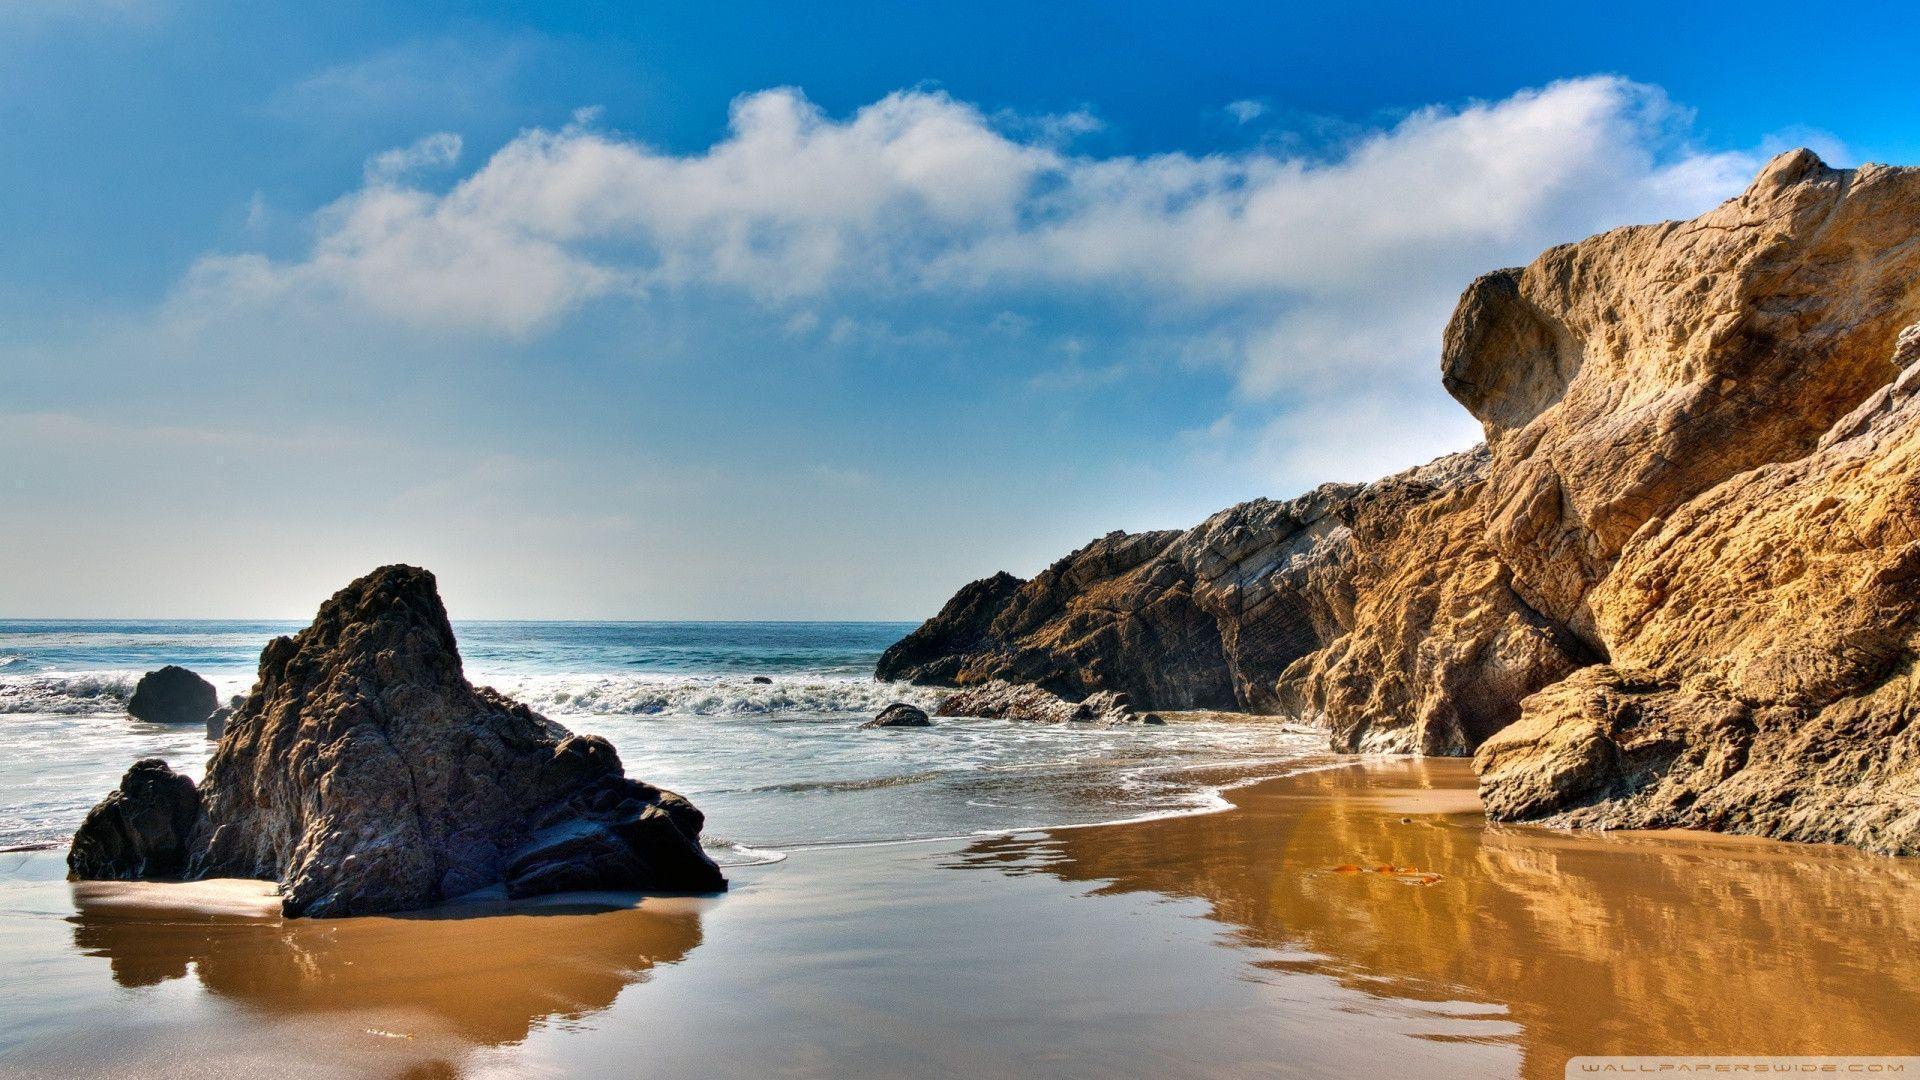 Retina Wallpaper Beach Sea Hd Desktop Wallpapers: California Beach Wallpapers